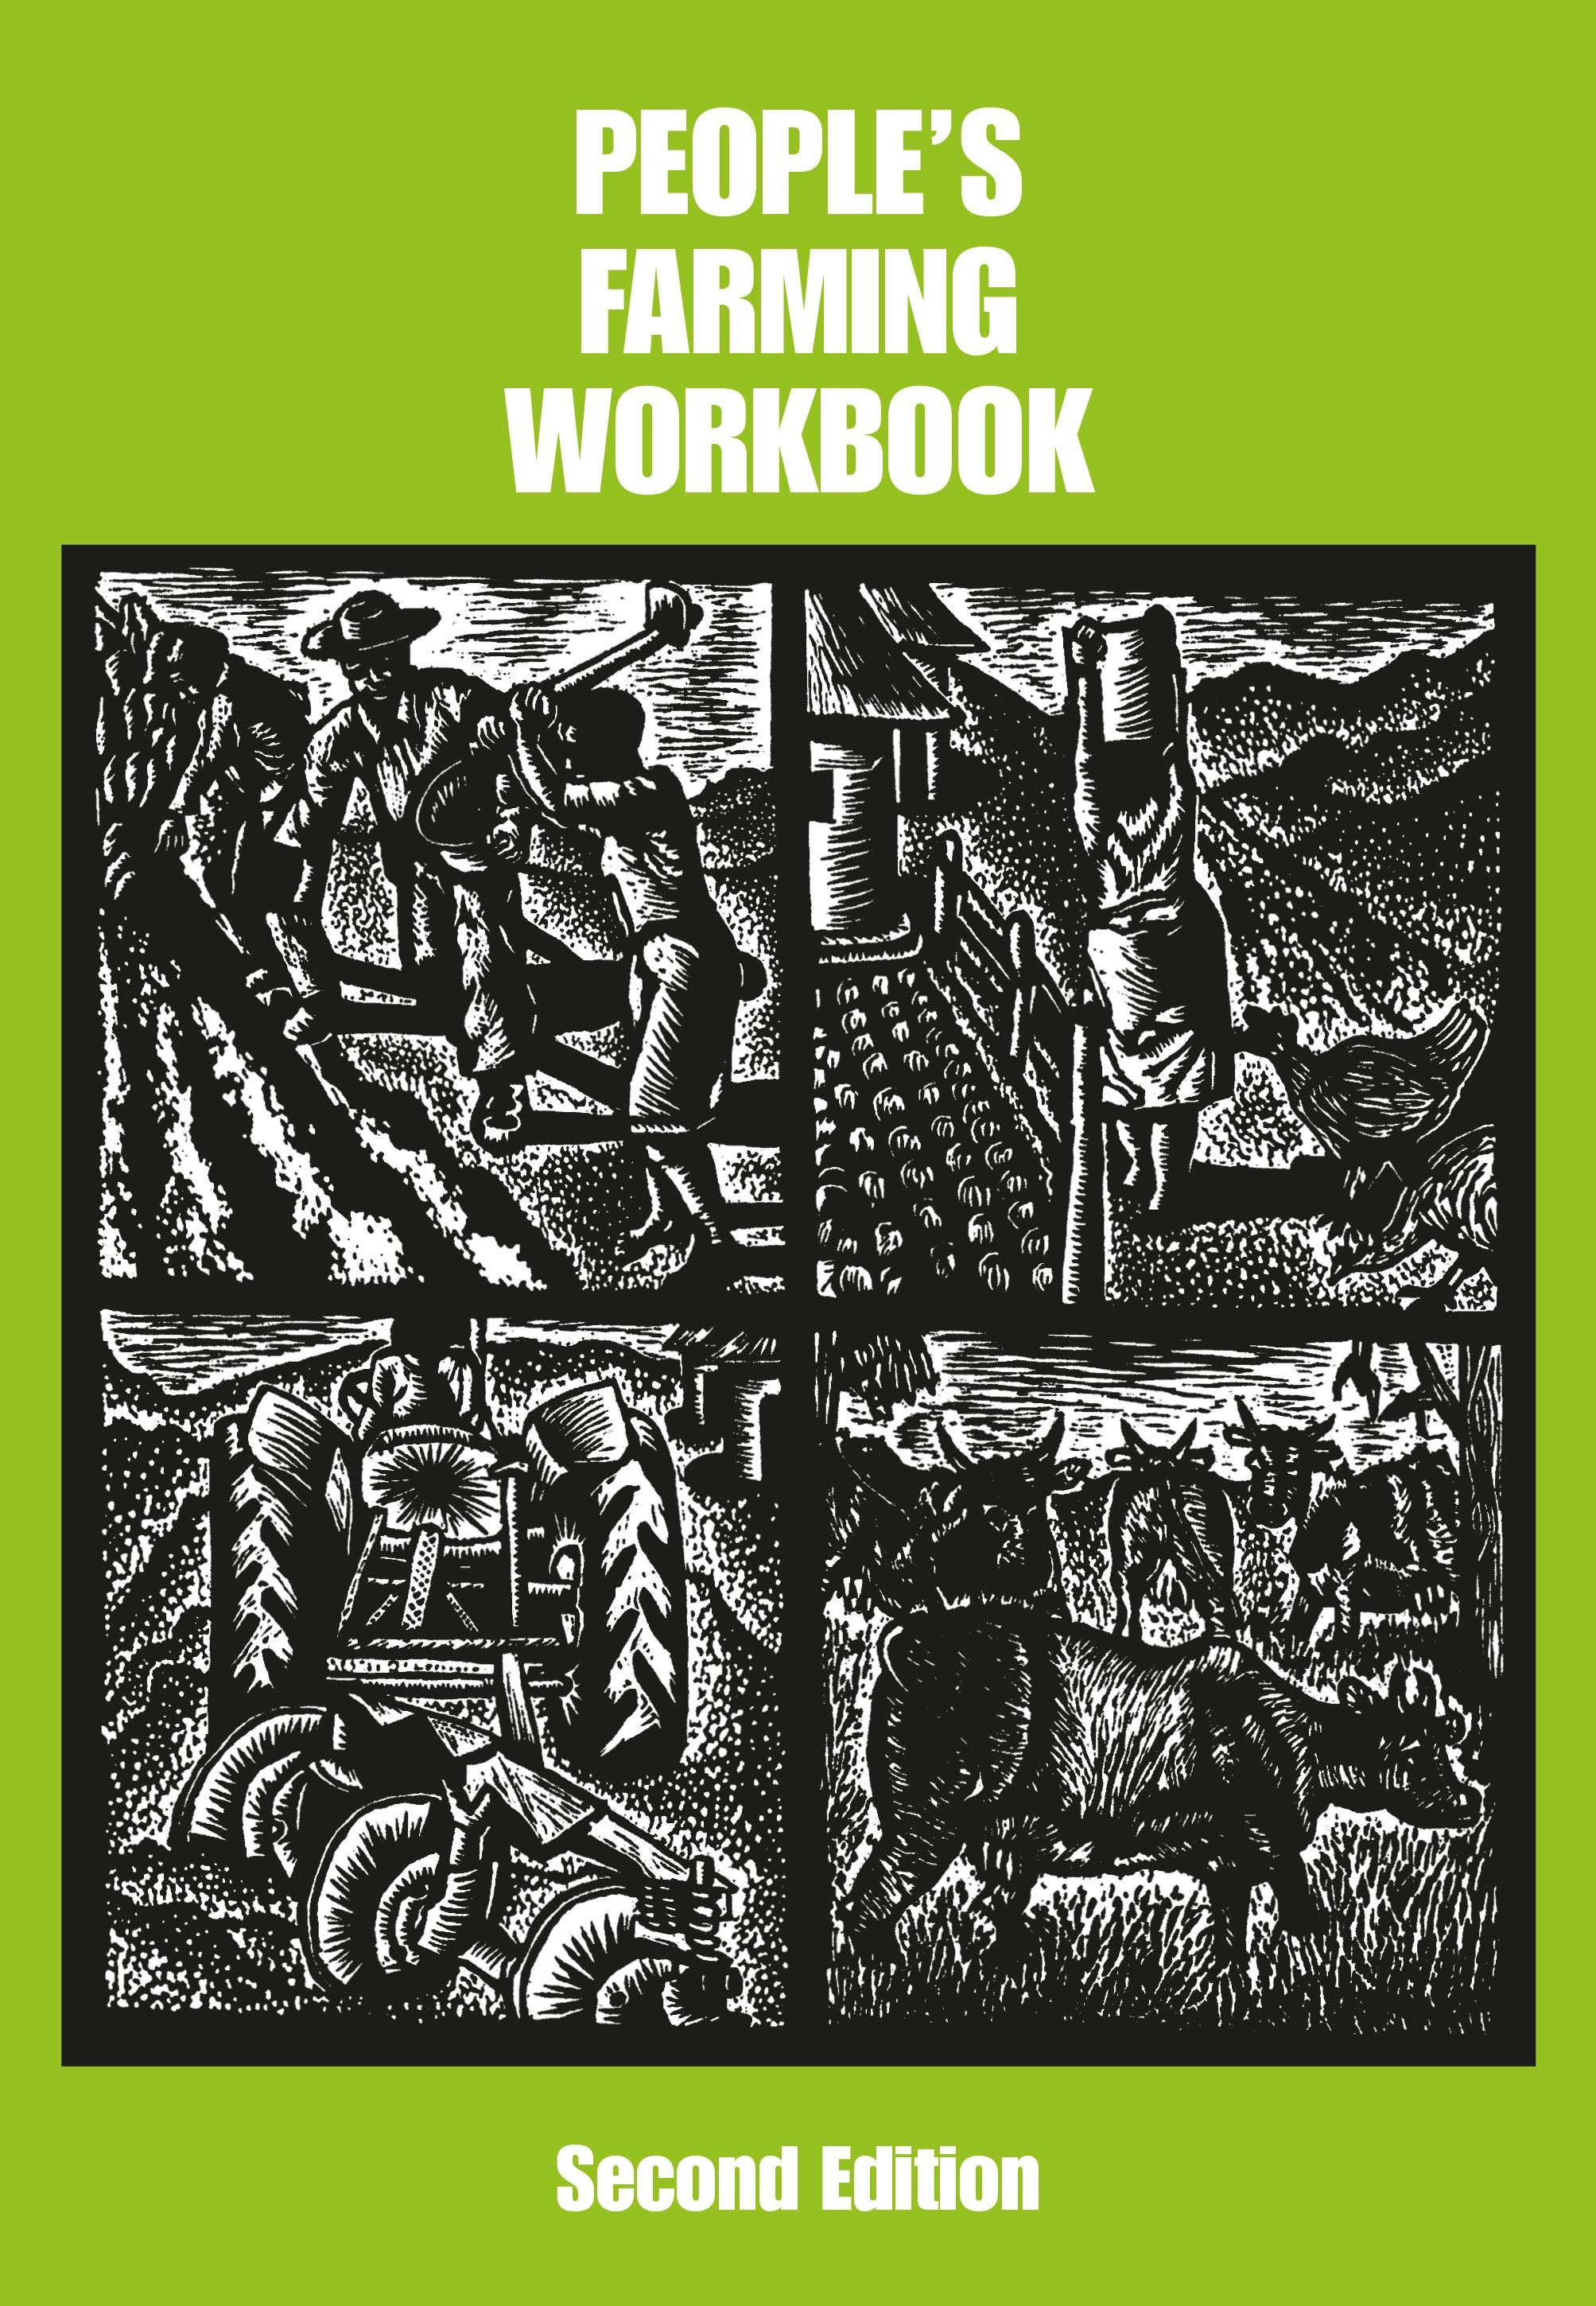 People's Farming Workbook